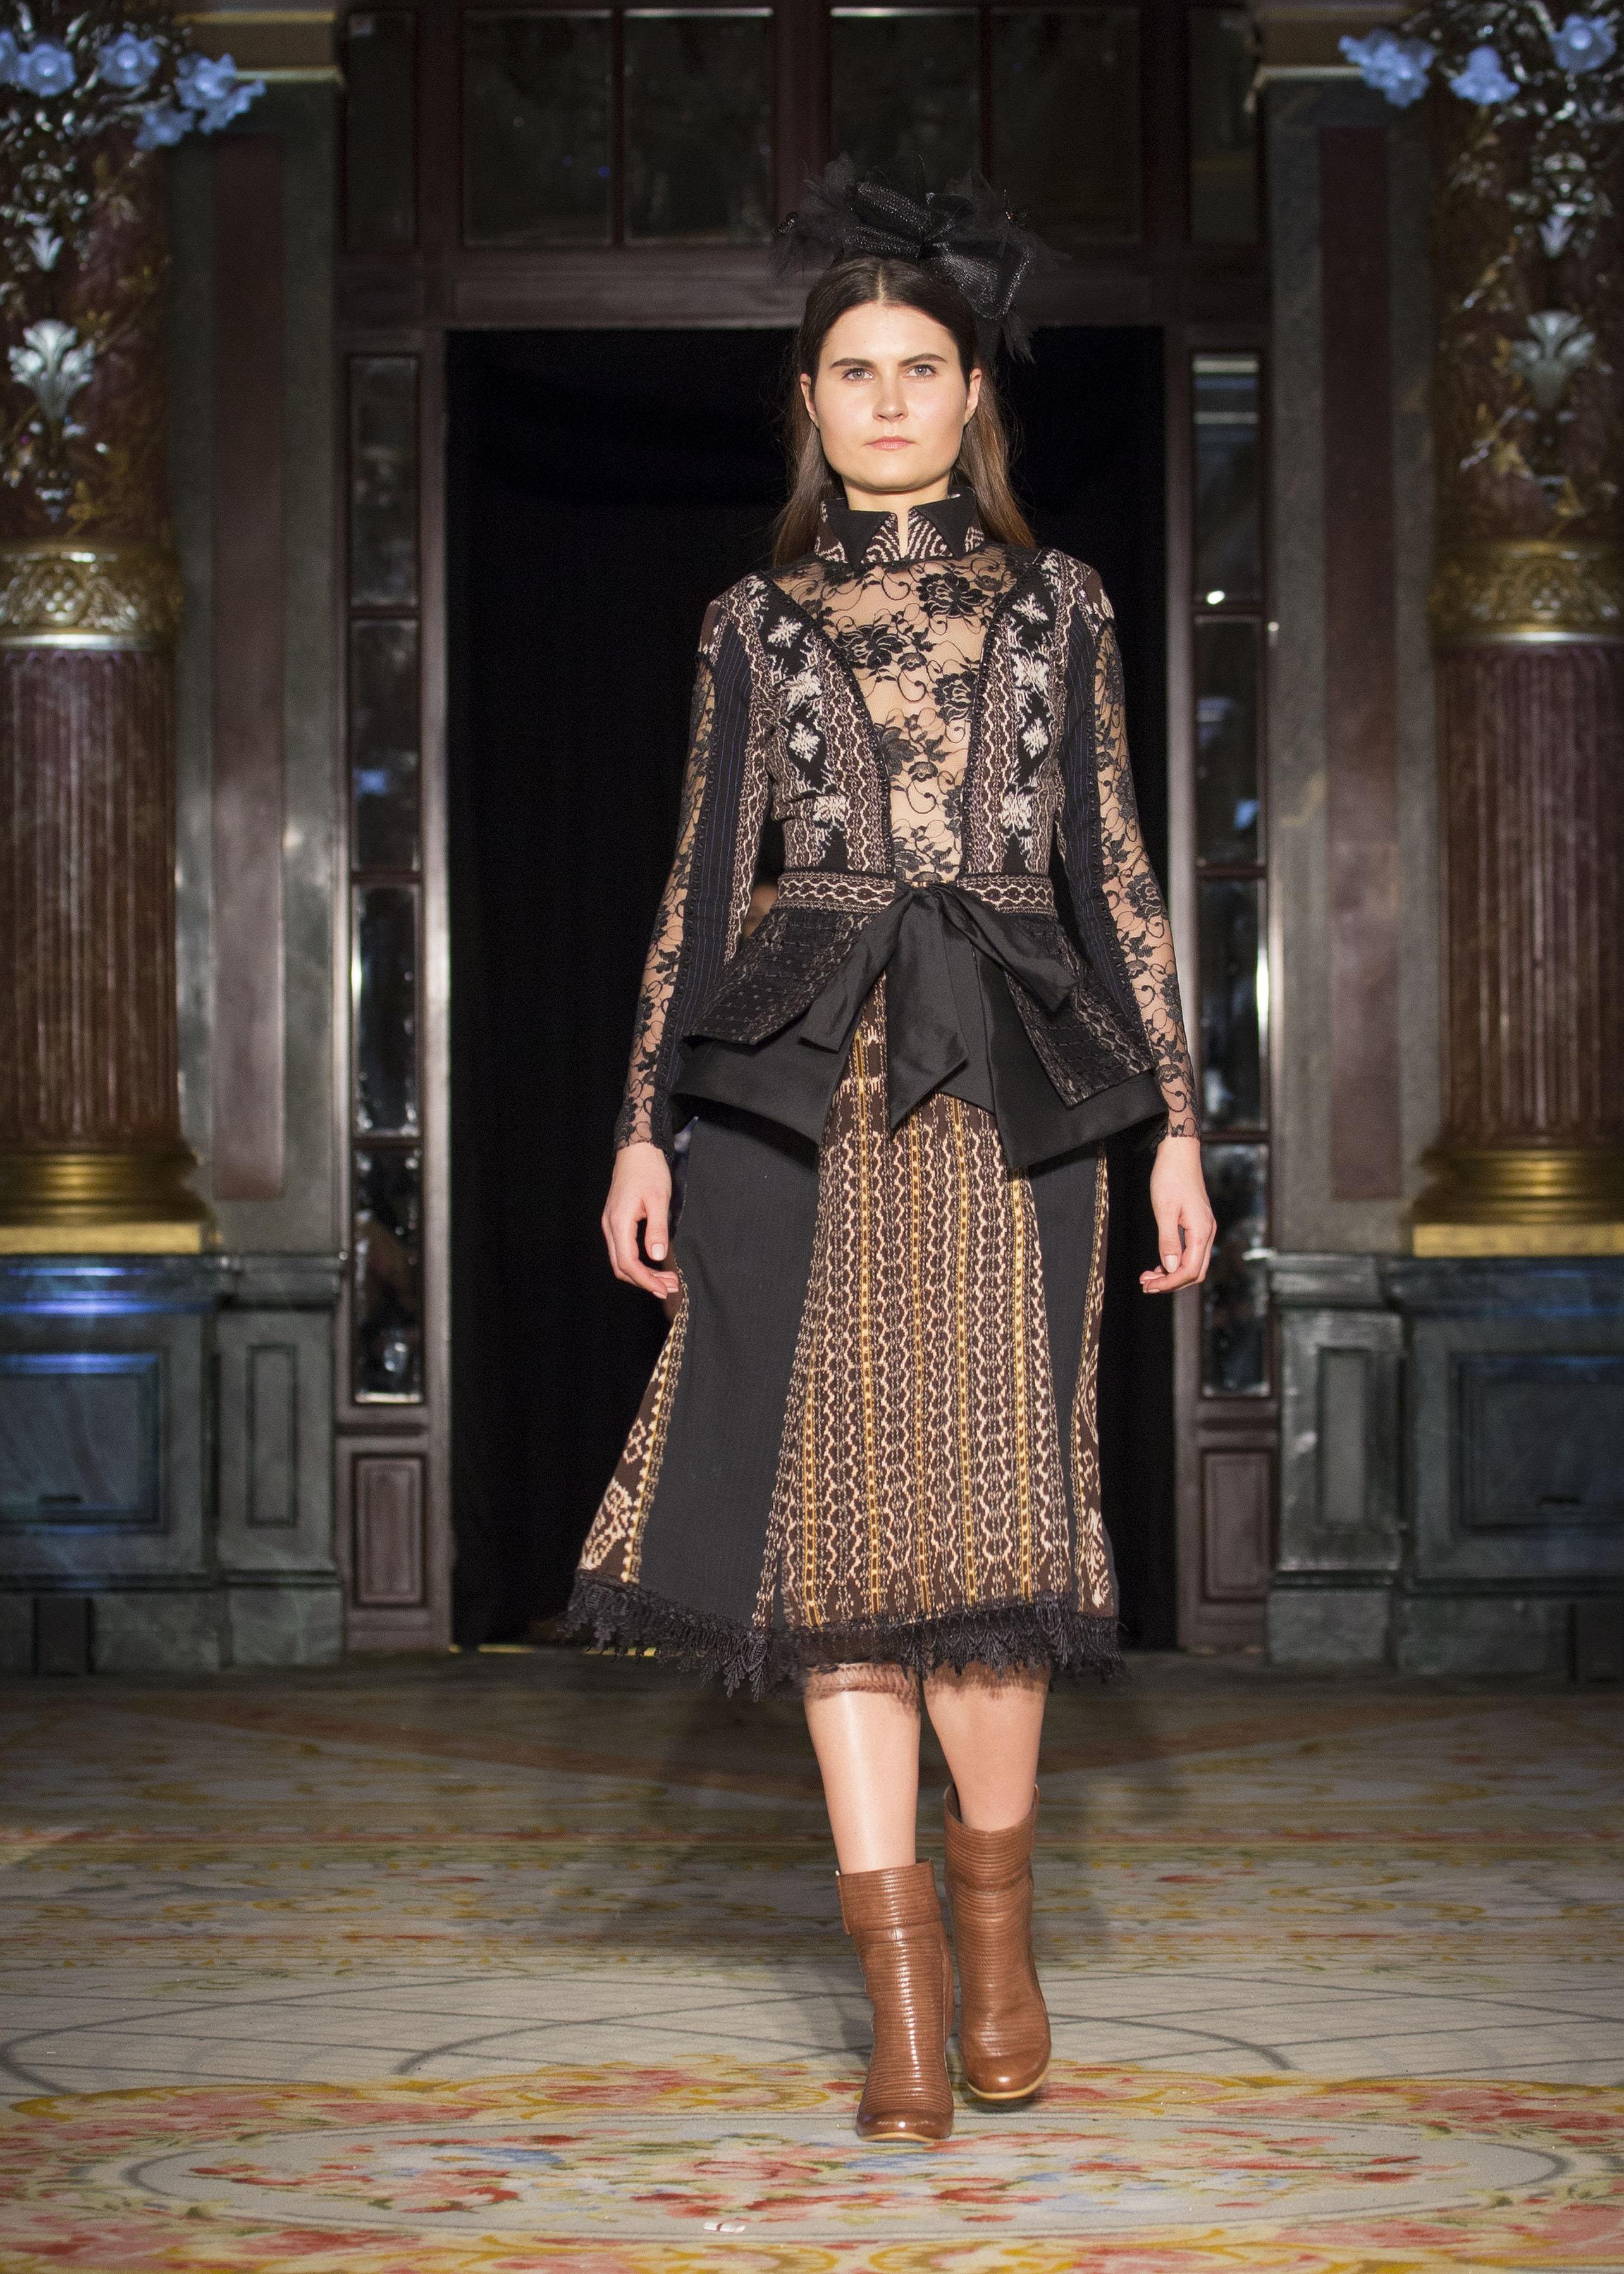 oxford fashion studio - paris fashion week 2018 - levico